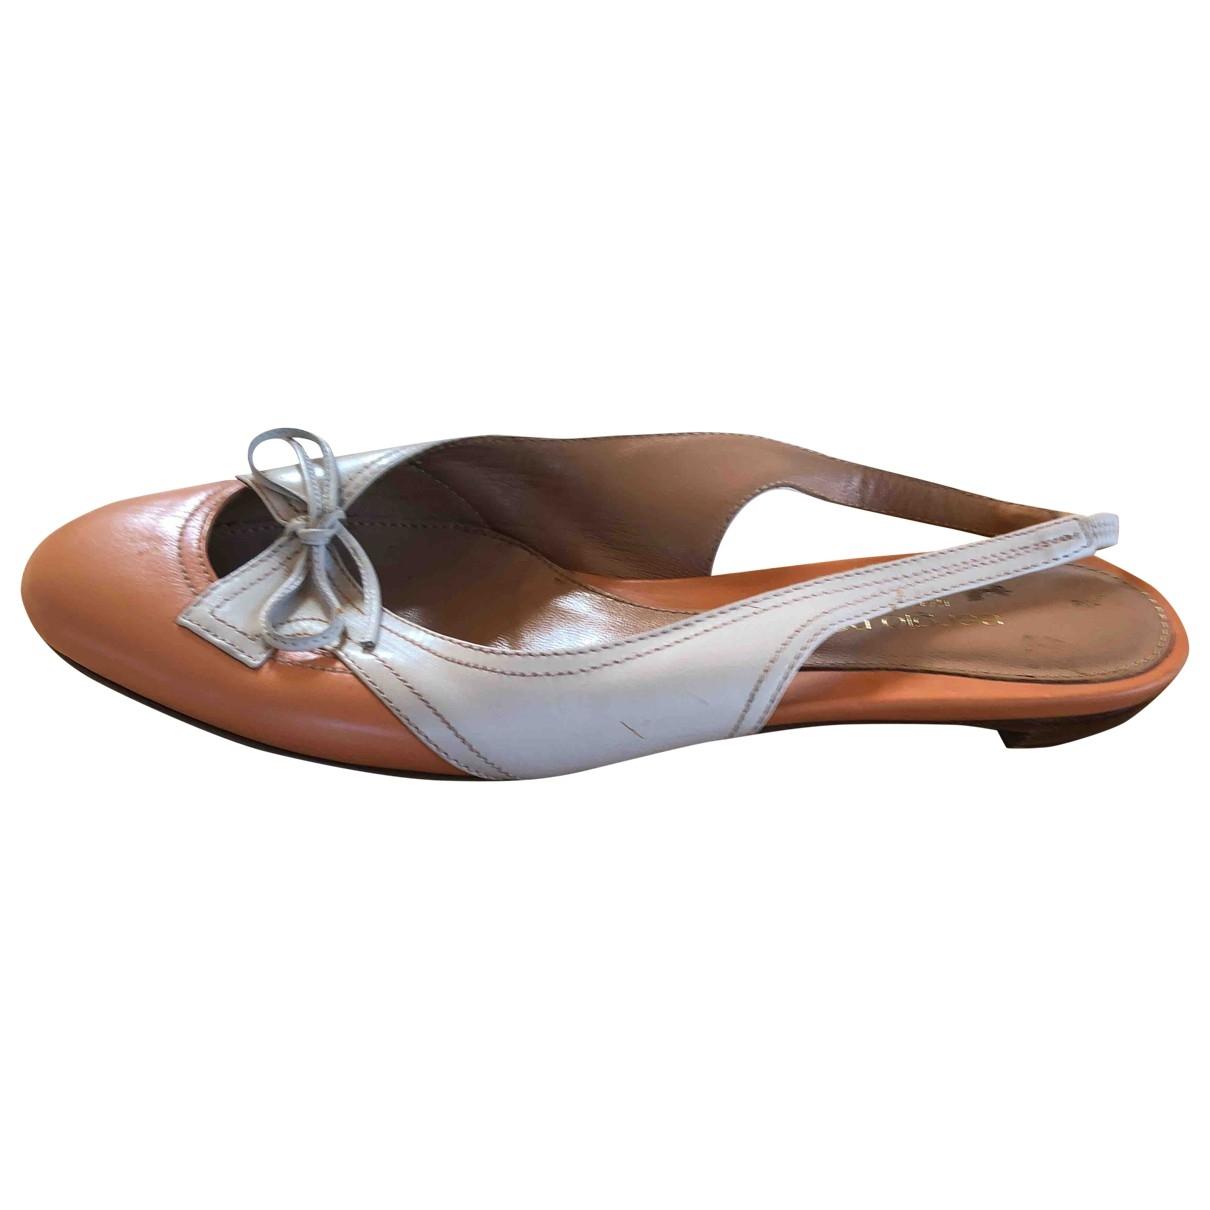 Sergio Rossi \N Beige Leather Sandals for Women 37.5 EU